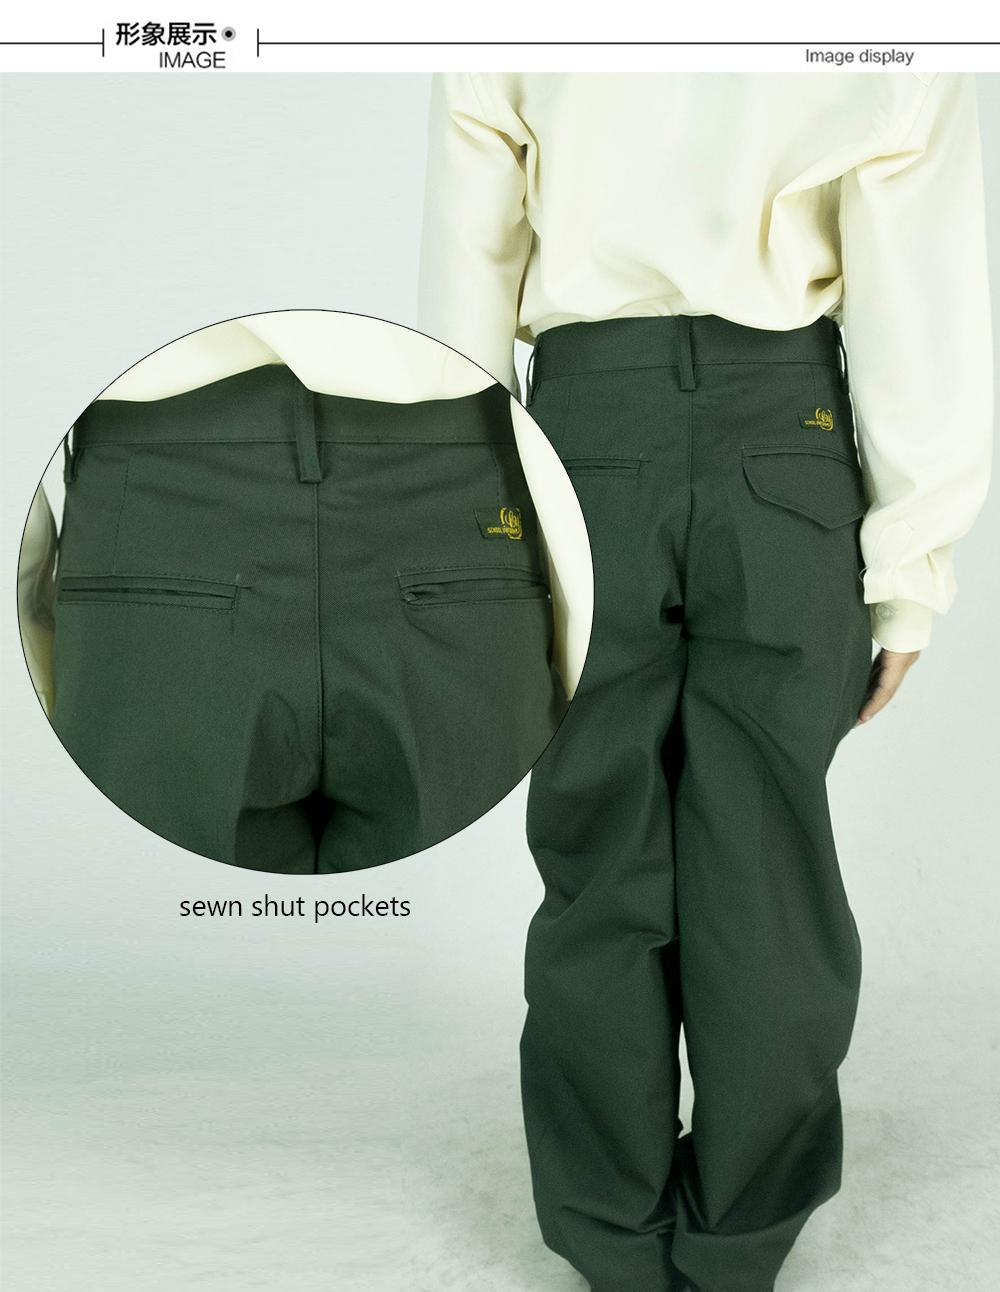 CY 8054G SELUAR PANJANG HIJAU SEKOLAH UNIFORM  / SCHOOL LONG PANTS GREEN / 中学青裤